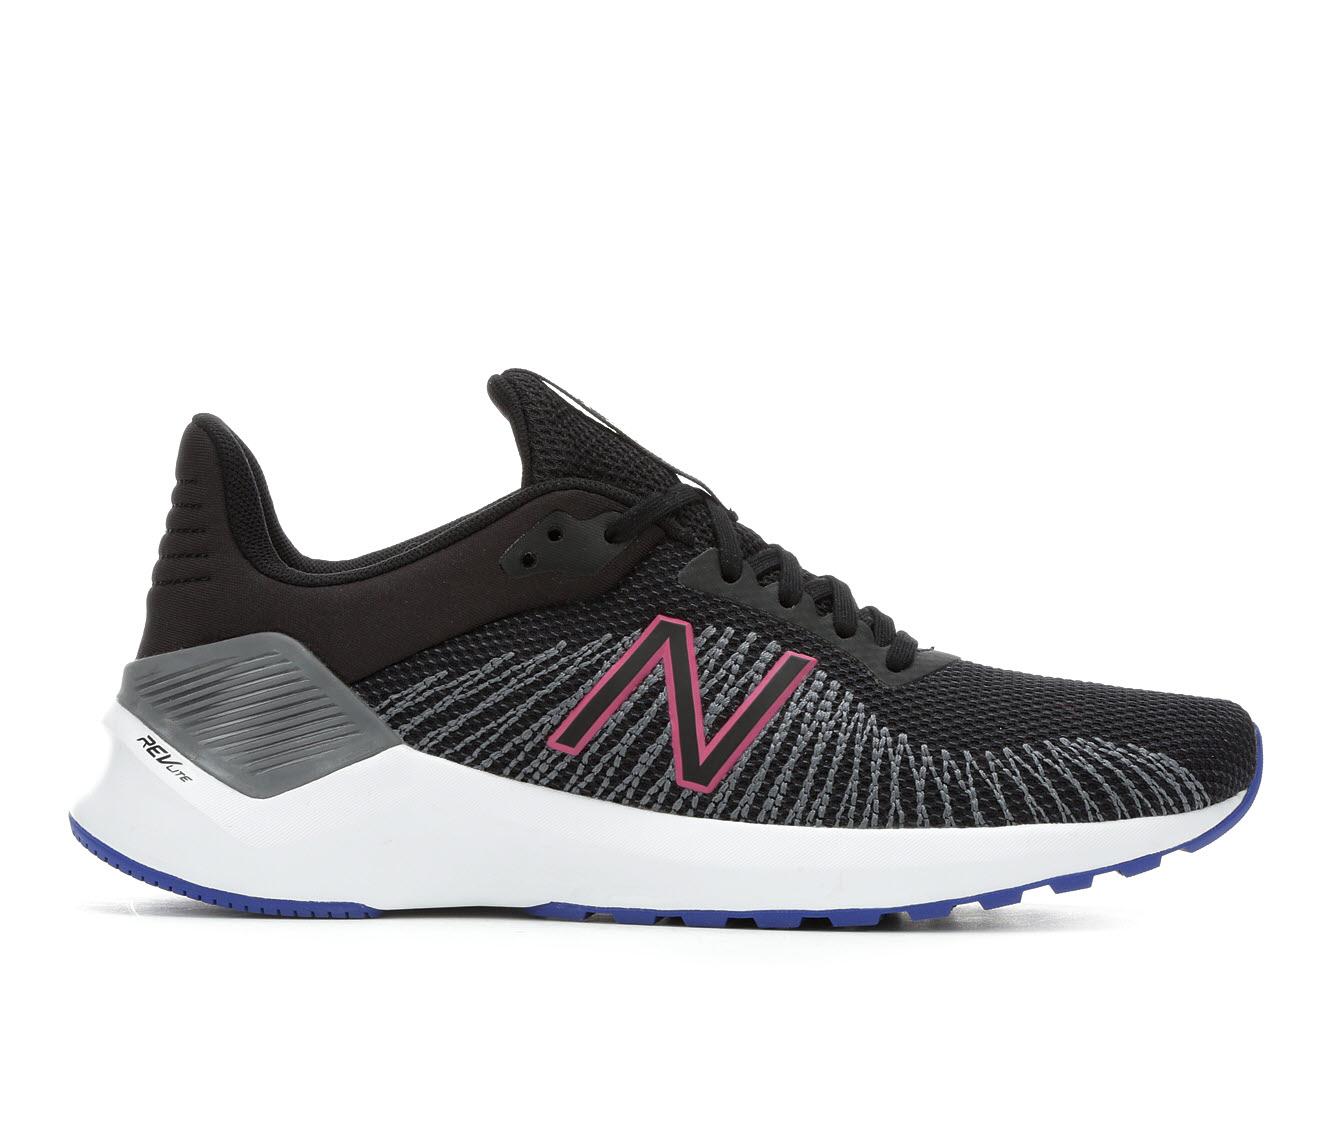 New Balance Ventr Women's Athletic Shoe (Black)